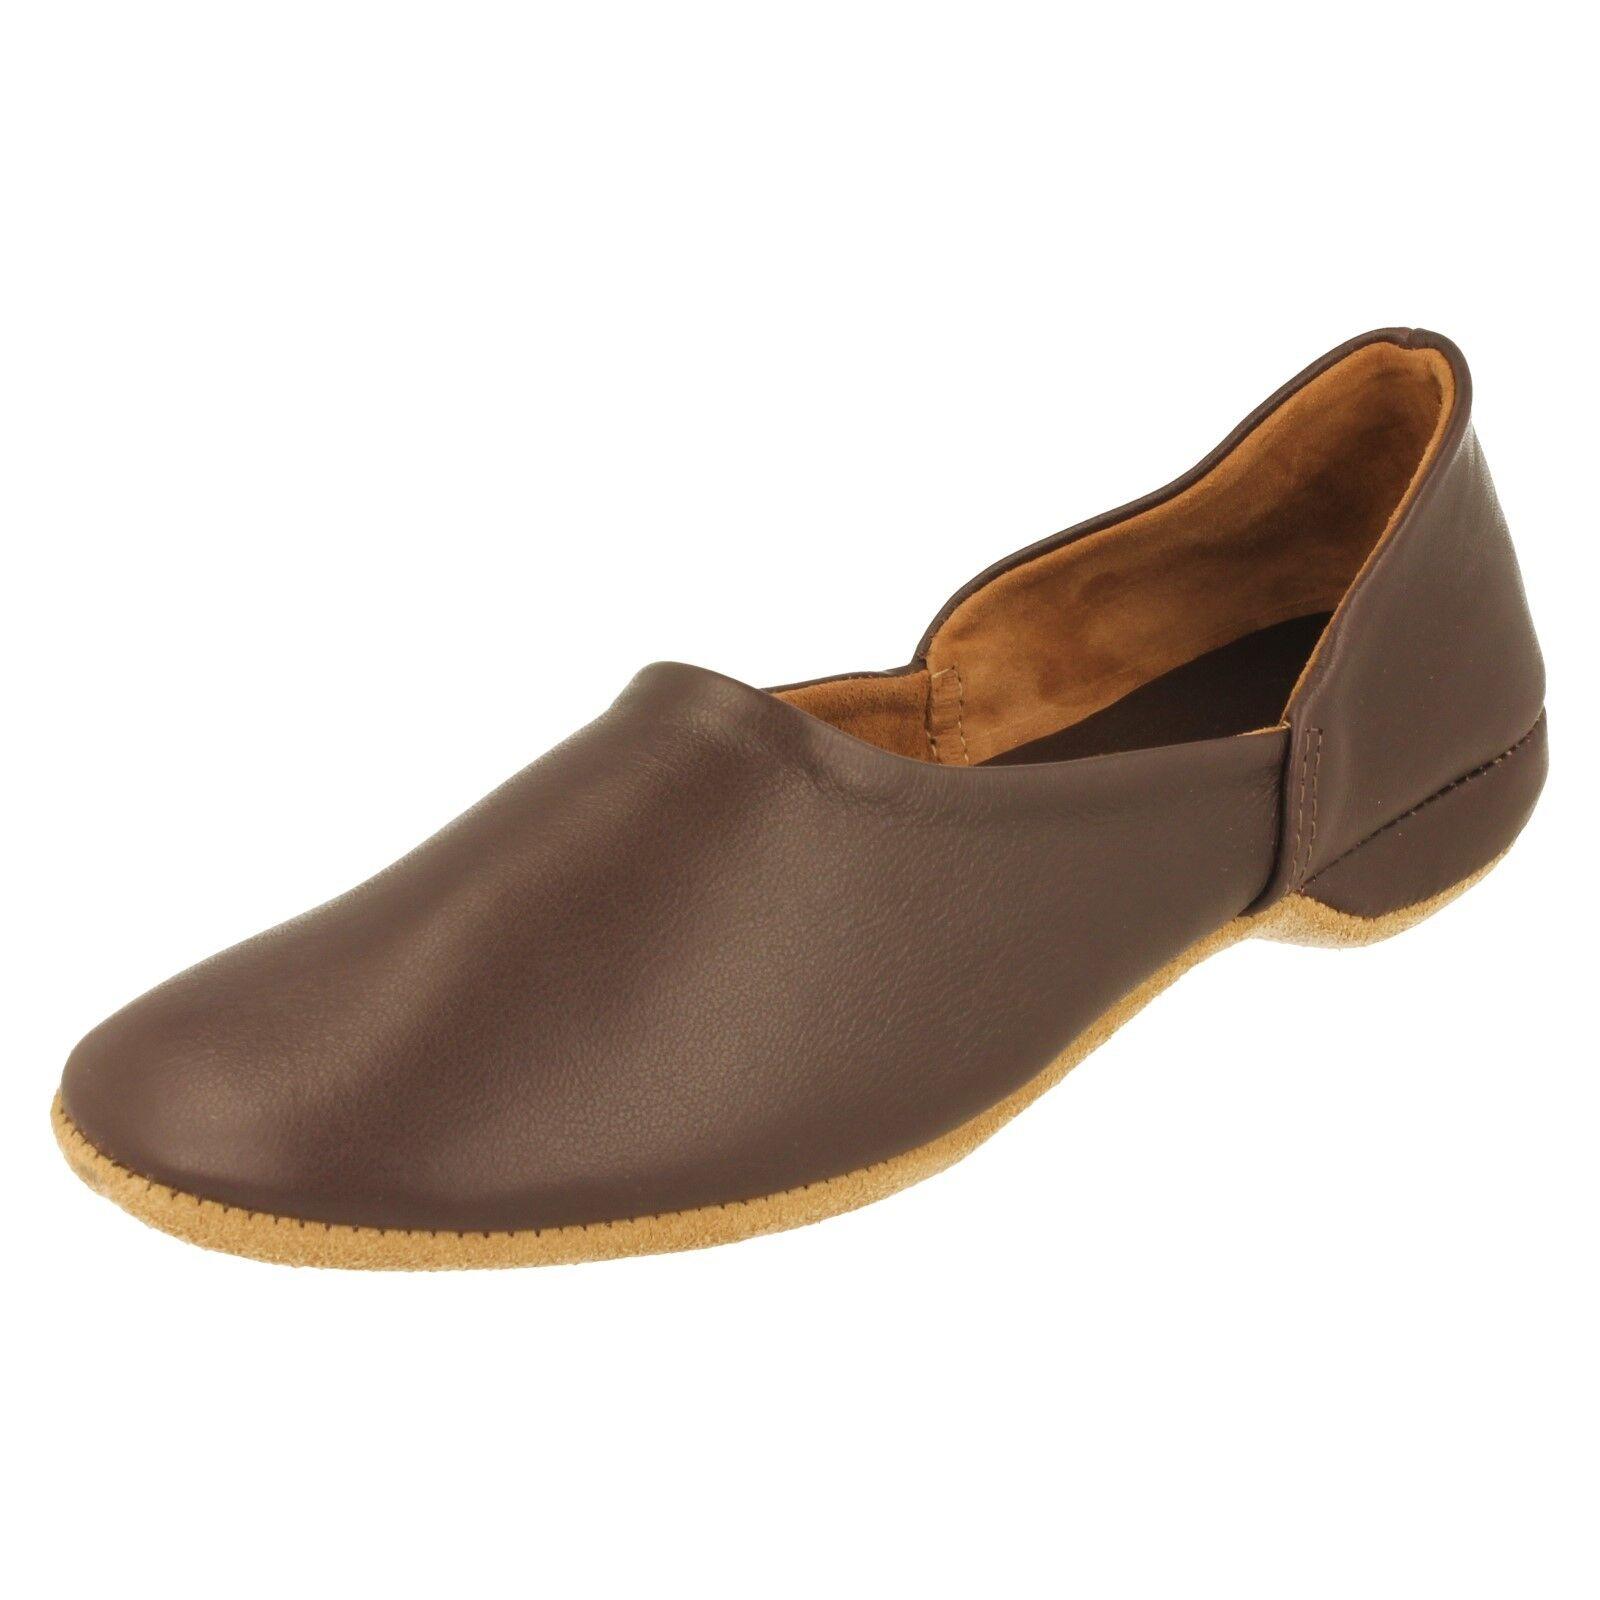 Mens Draper Leather Slippers - Charles